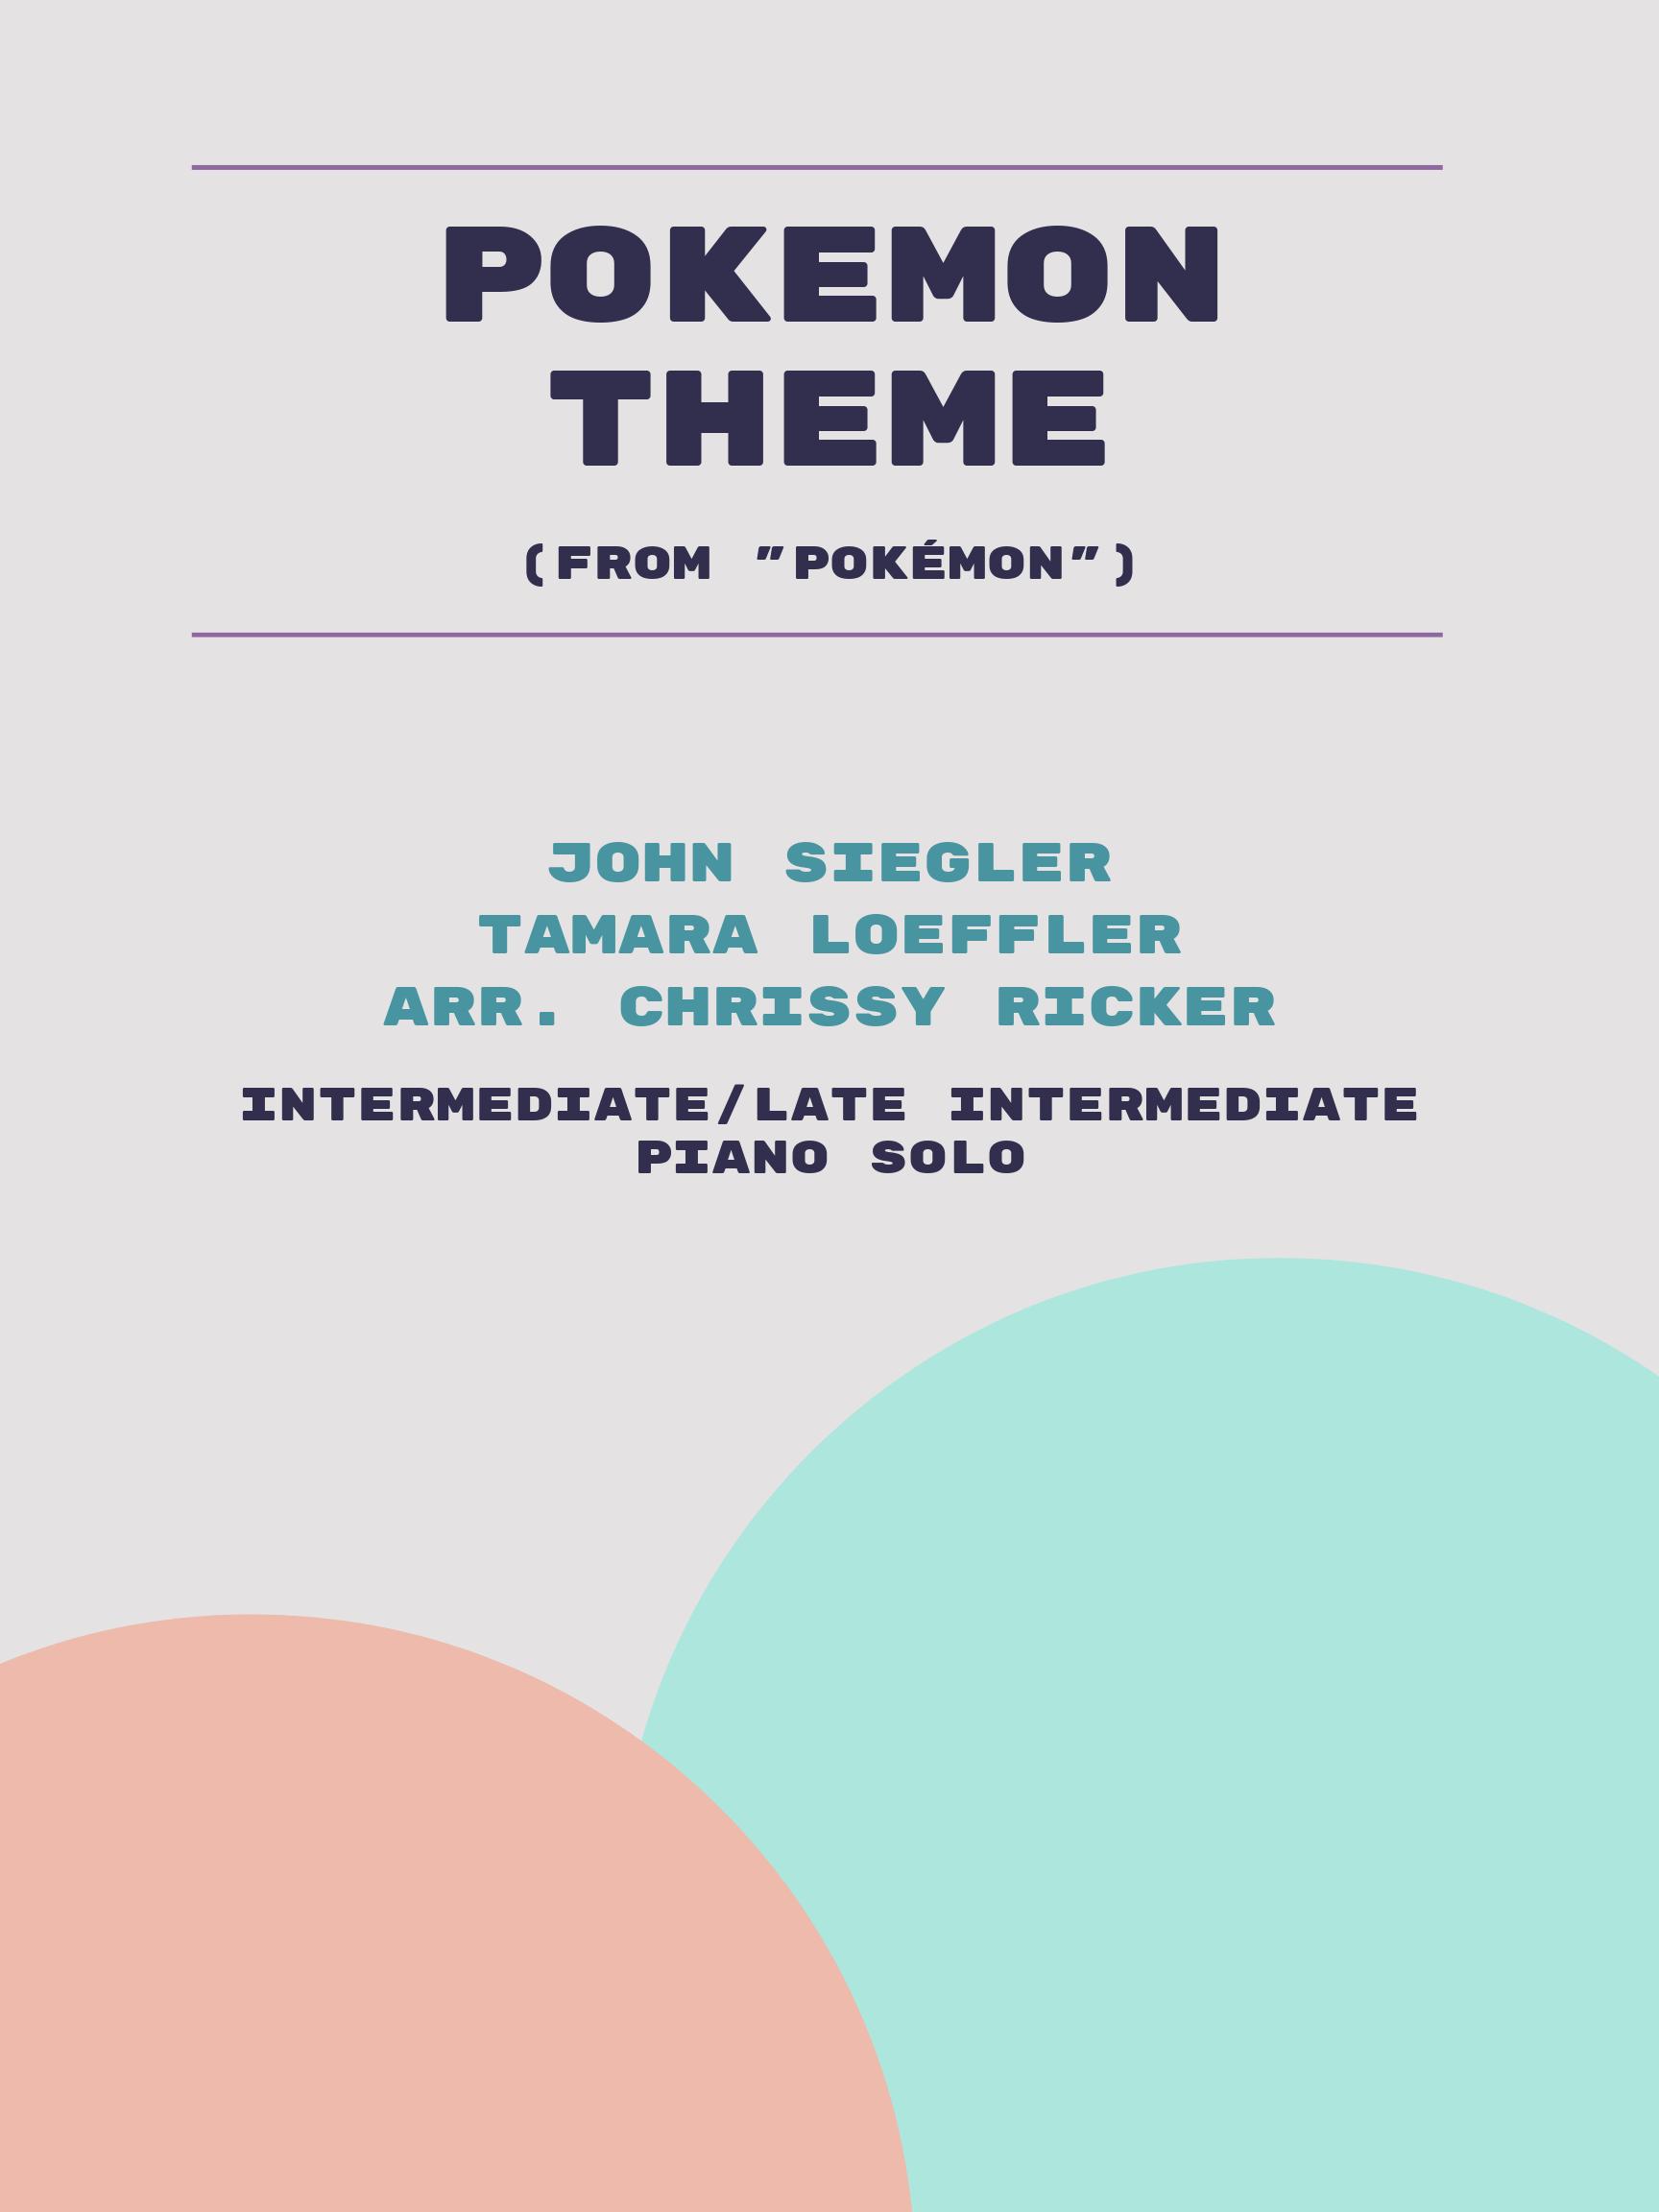 Pokemon Theme by John Siegler, Tamara Loeffler